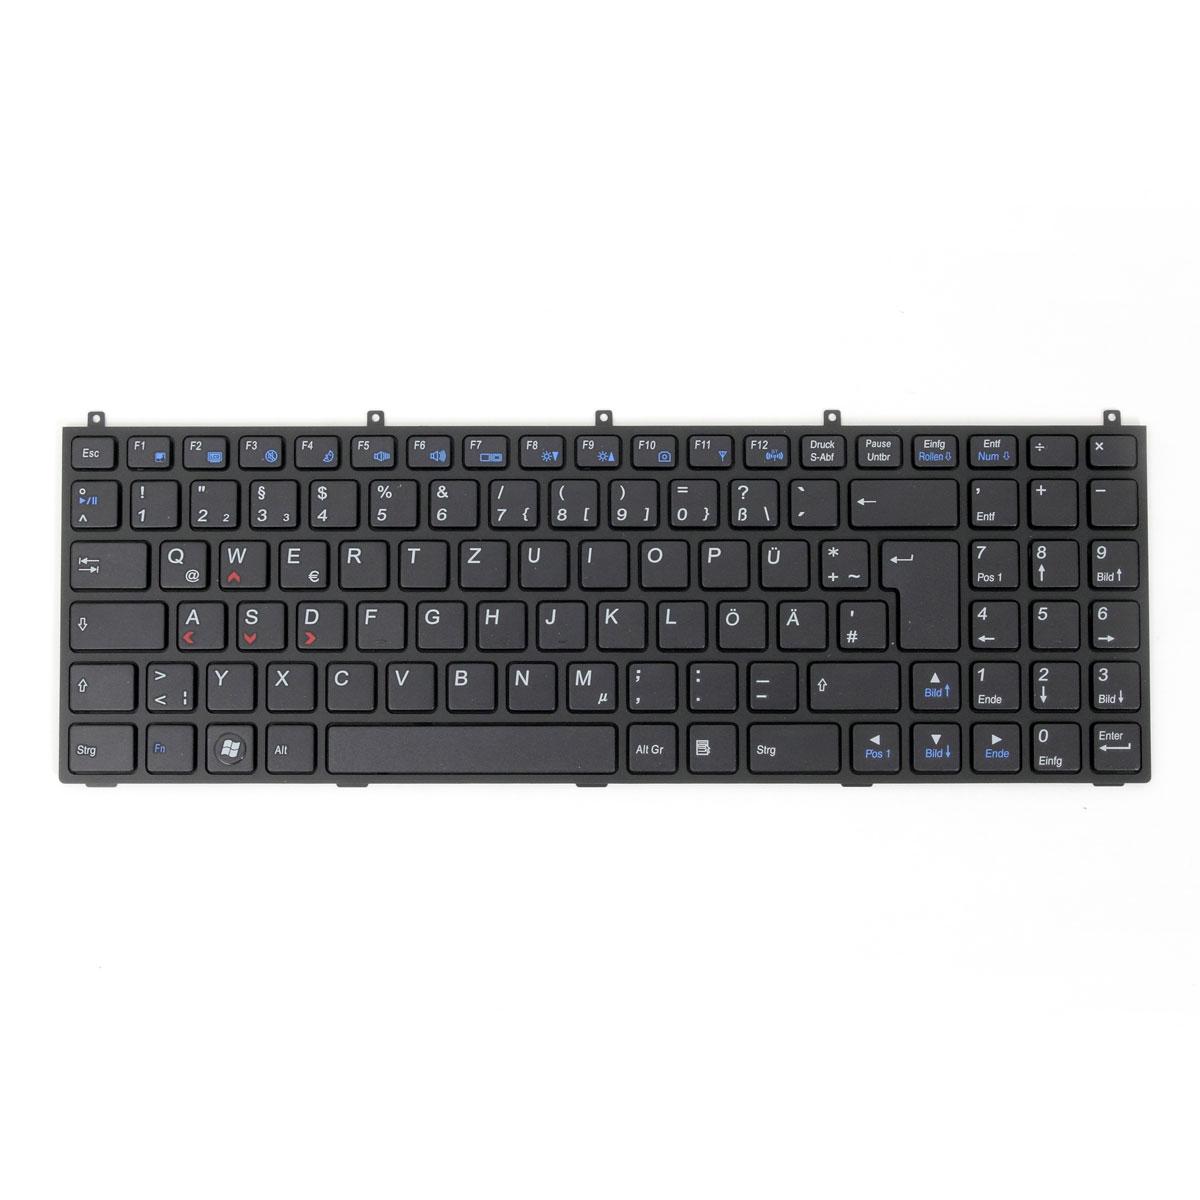 clavier pour pc portable ldlc bellone gb2 allemand kb. Black Bedroom Furniture Sets. Home Design Ideas